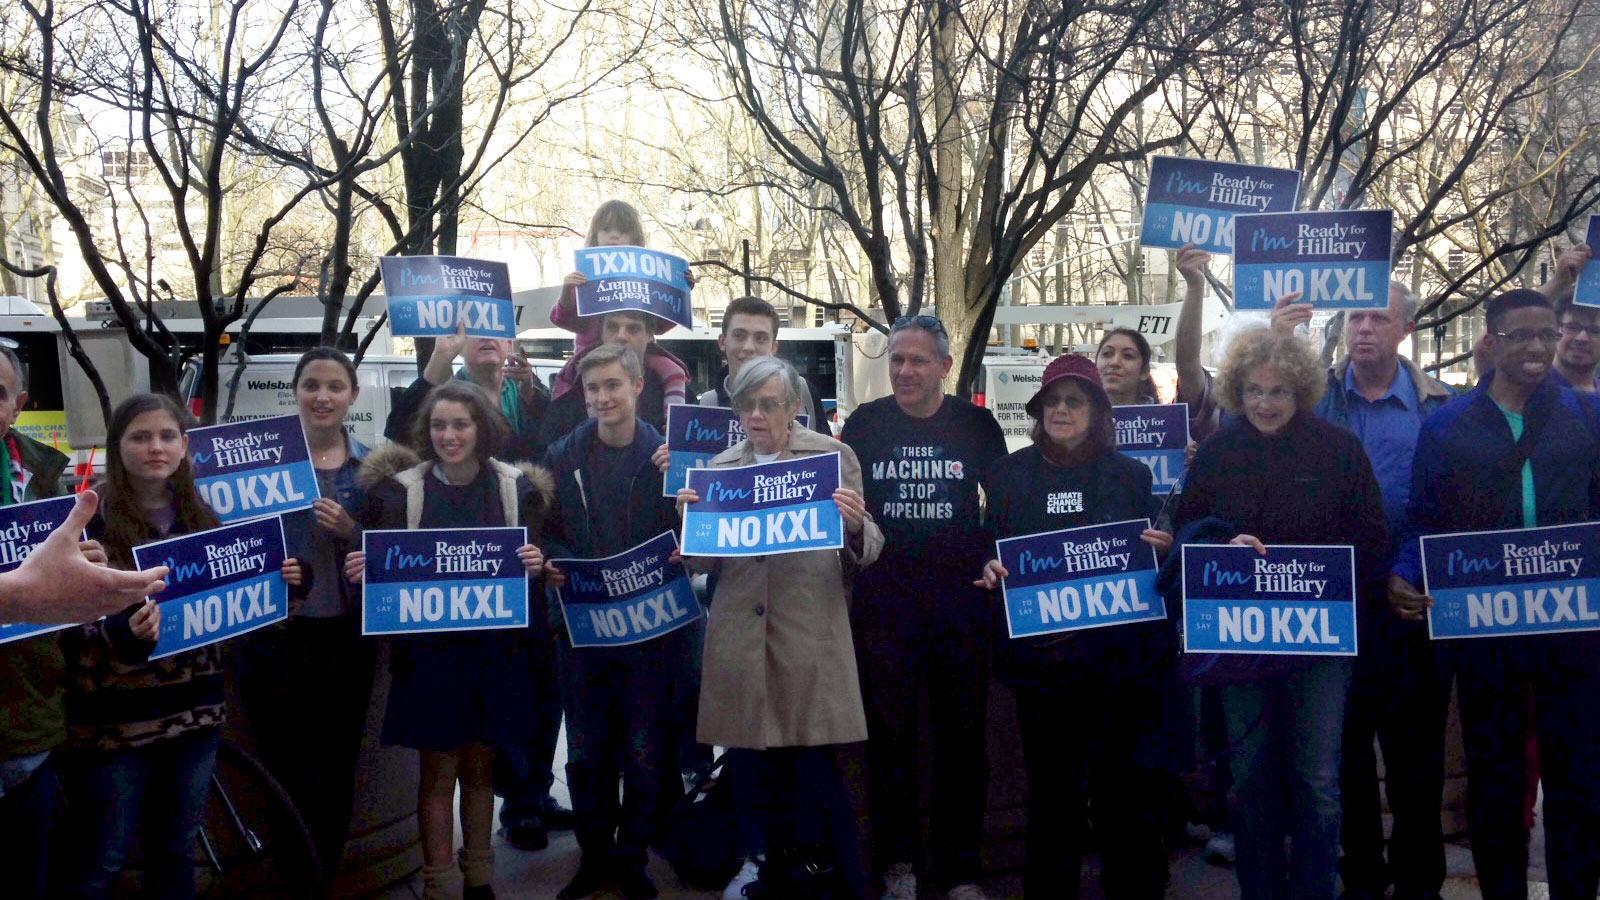 anti-Keystone protestors rally outside Clinton headquarters